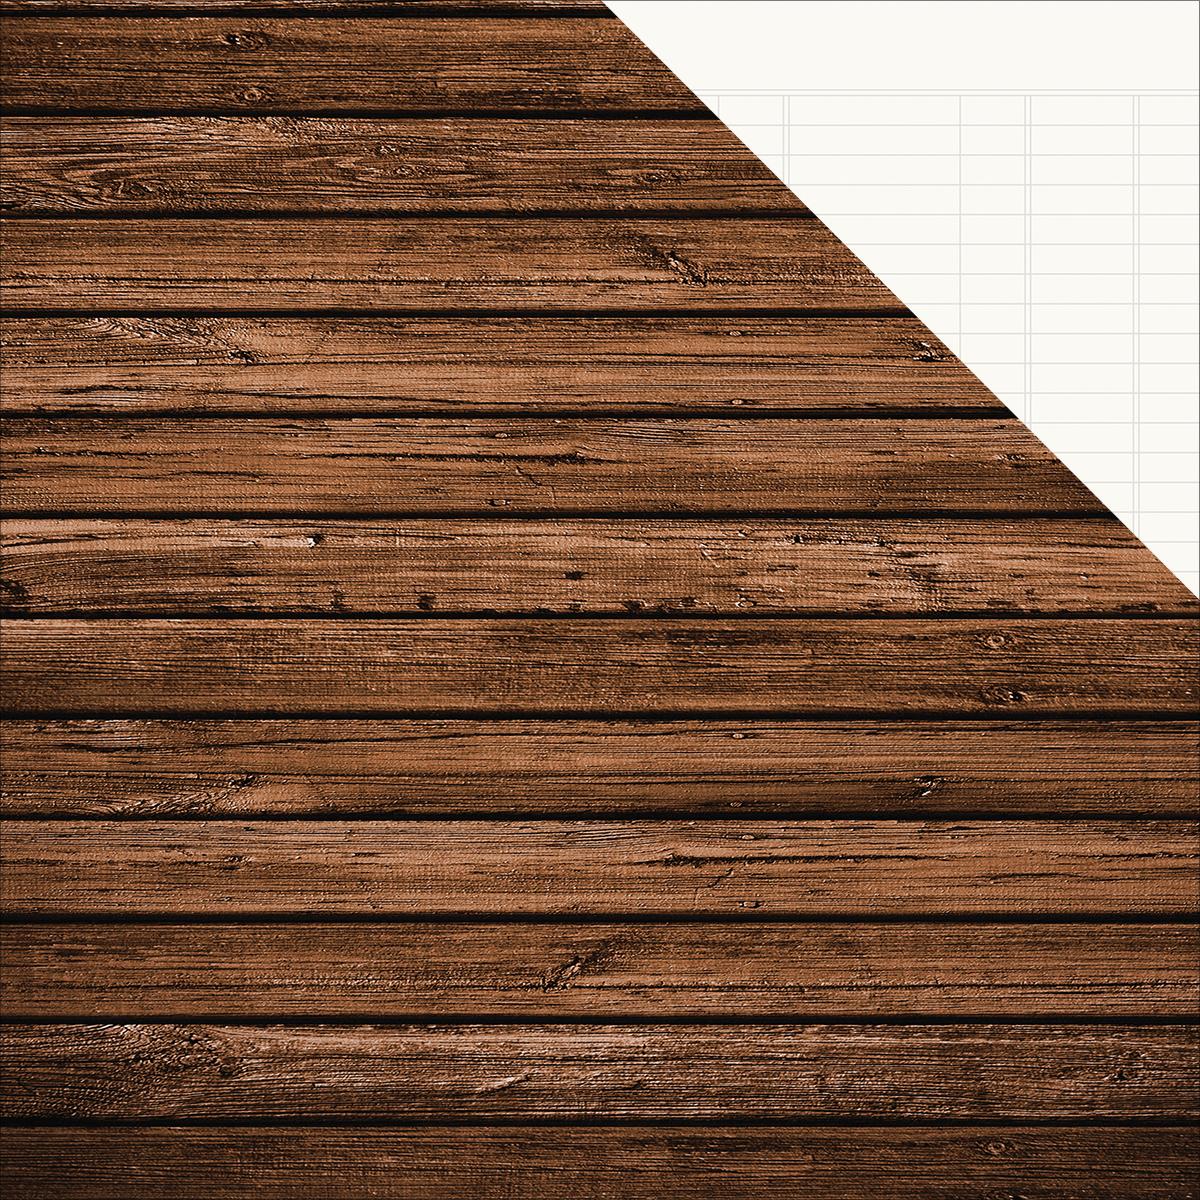 Sn@p! Basics Color Vibe Double-Sided Cardstock 12X12-Elm/Cream Ledger